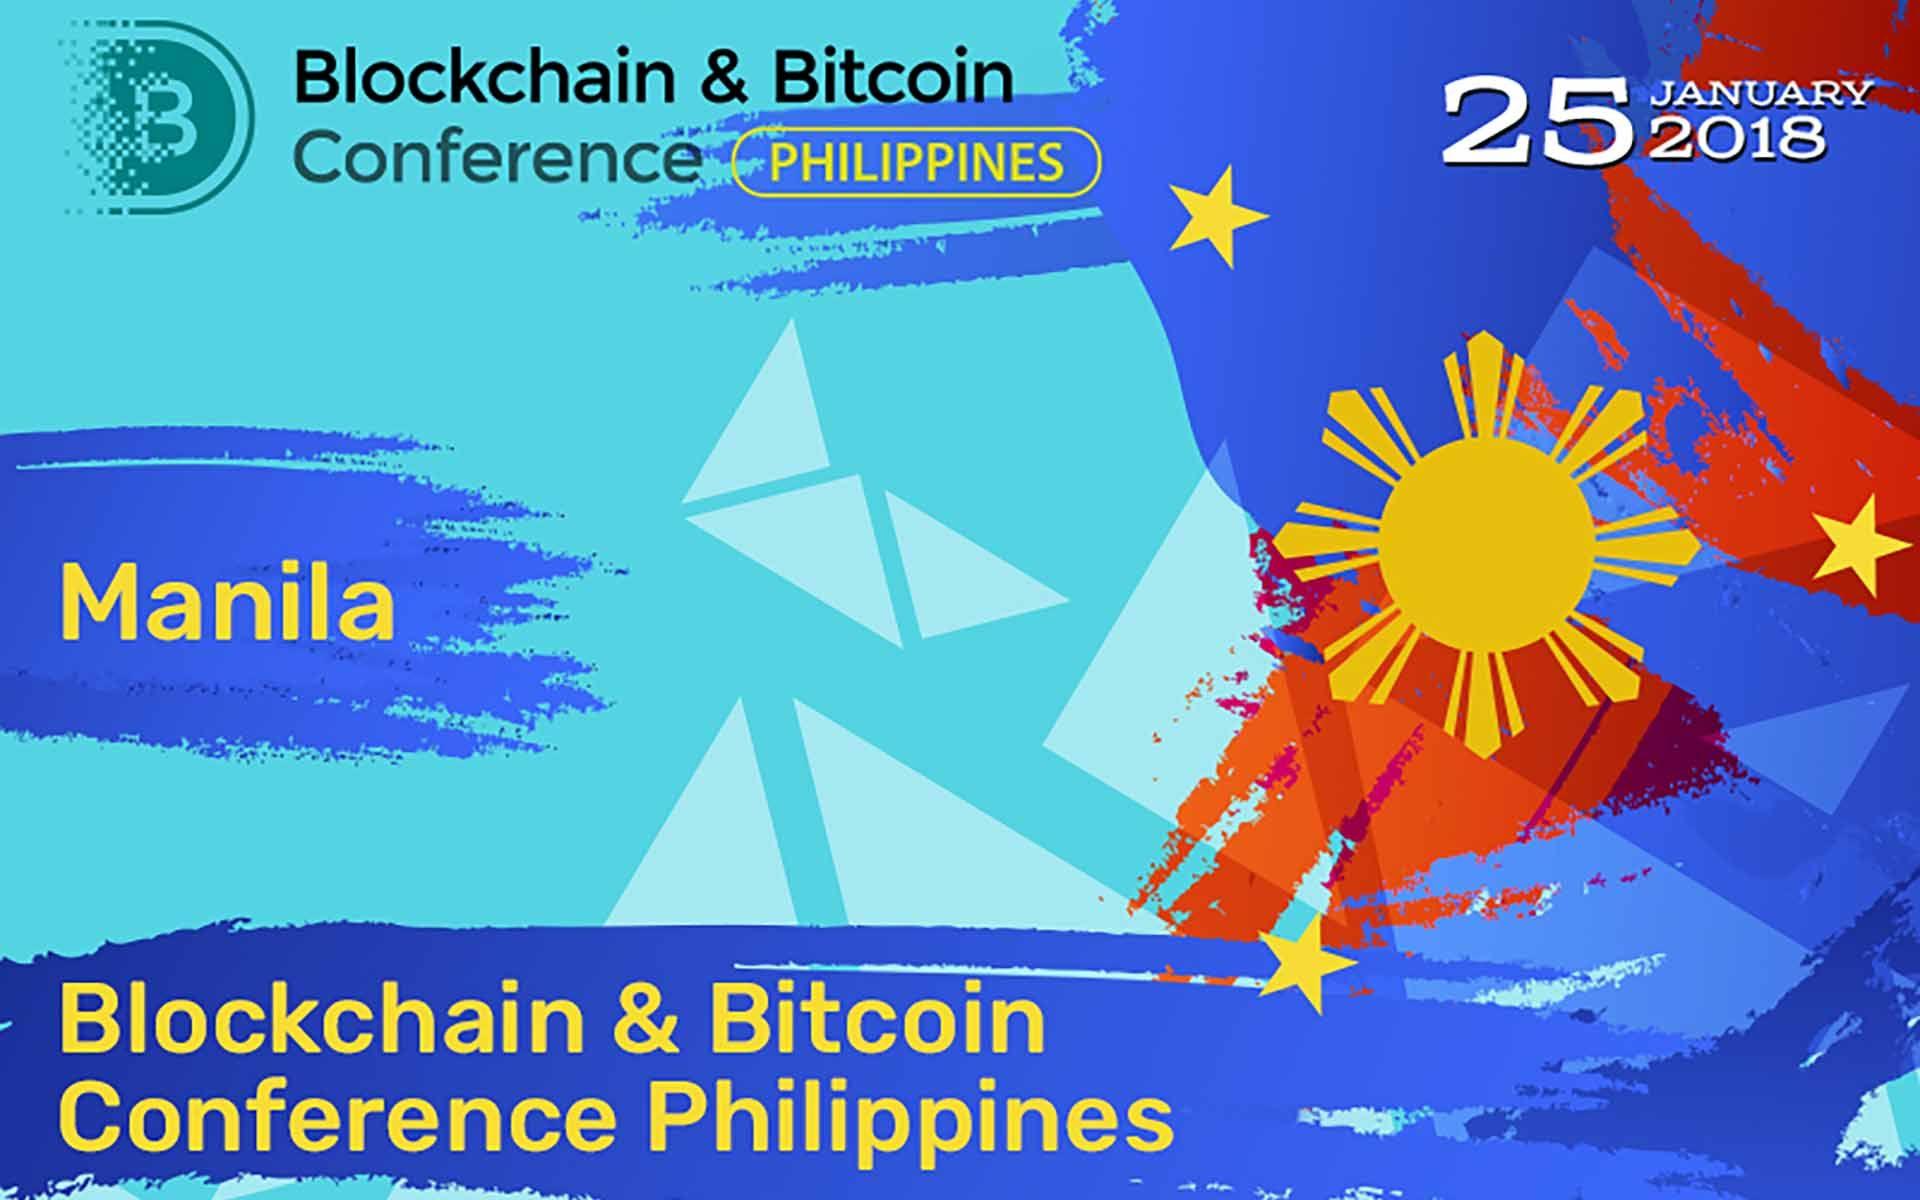 Bitcoin Singaporeus Largest Venture Investor Zach Piester Advises on